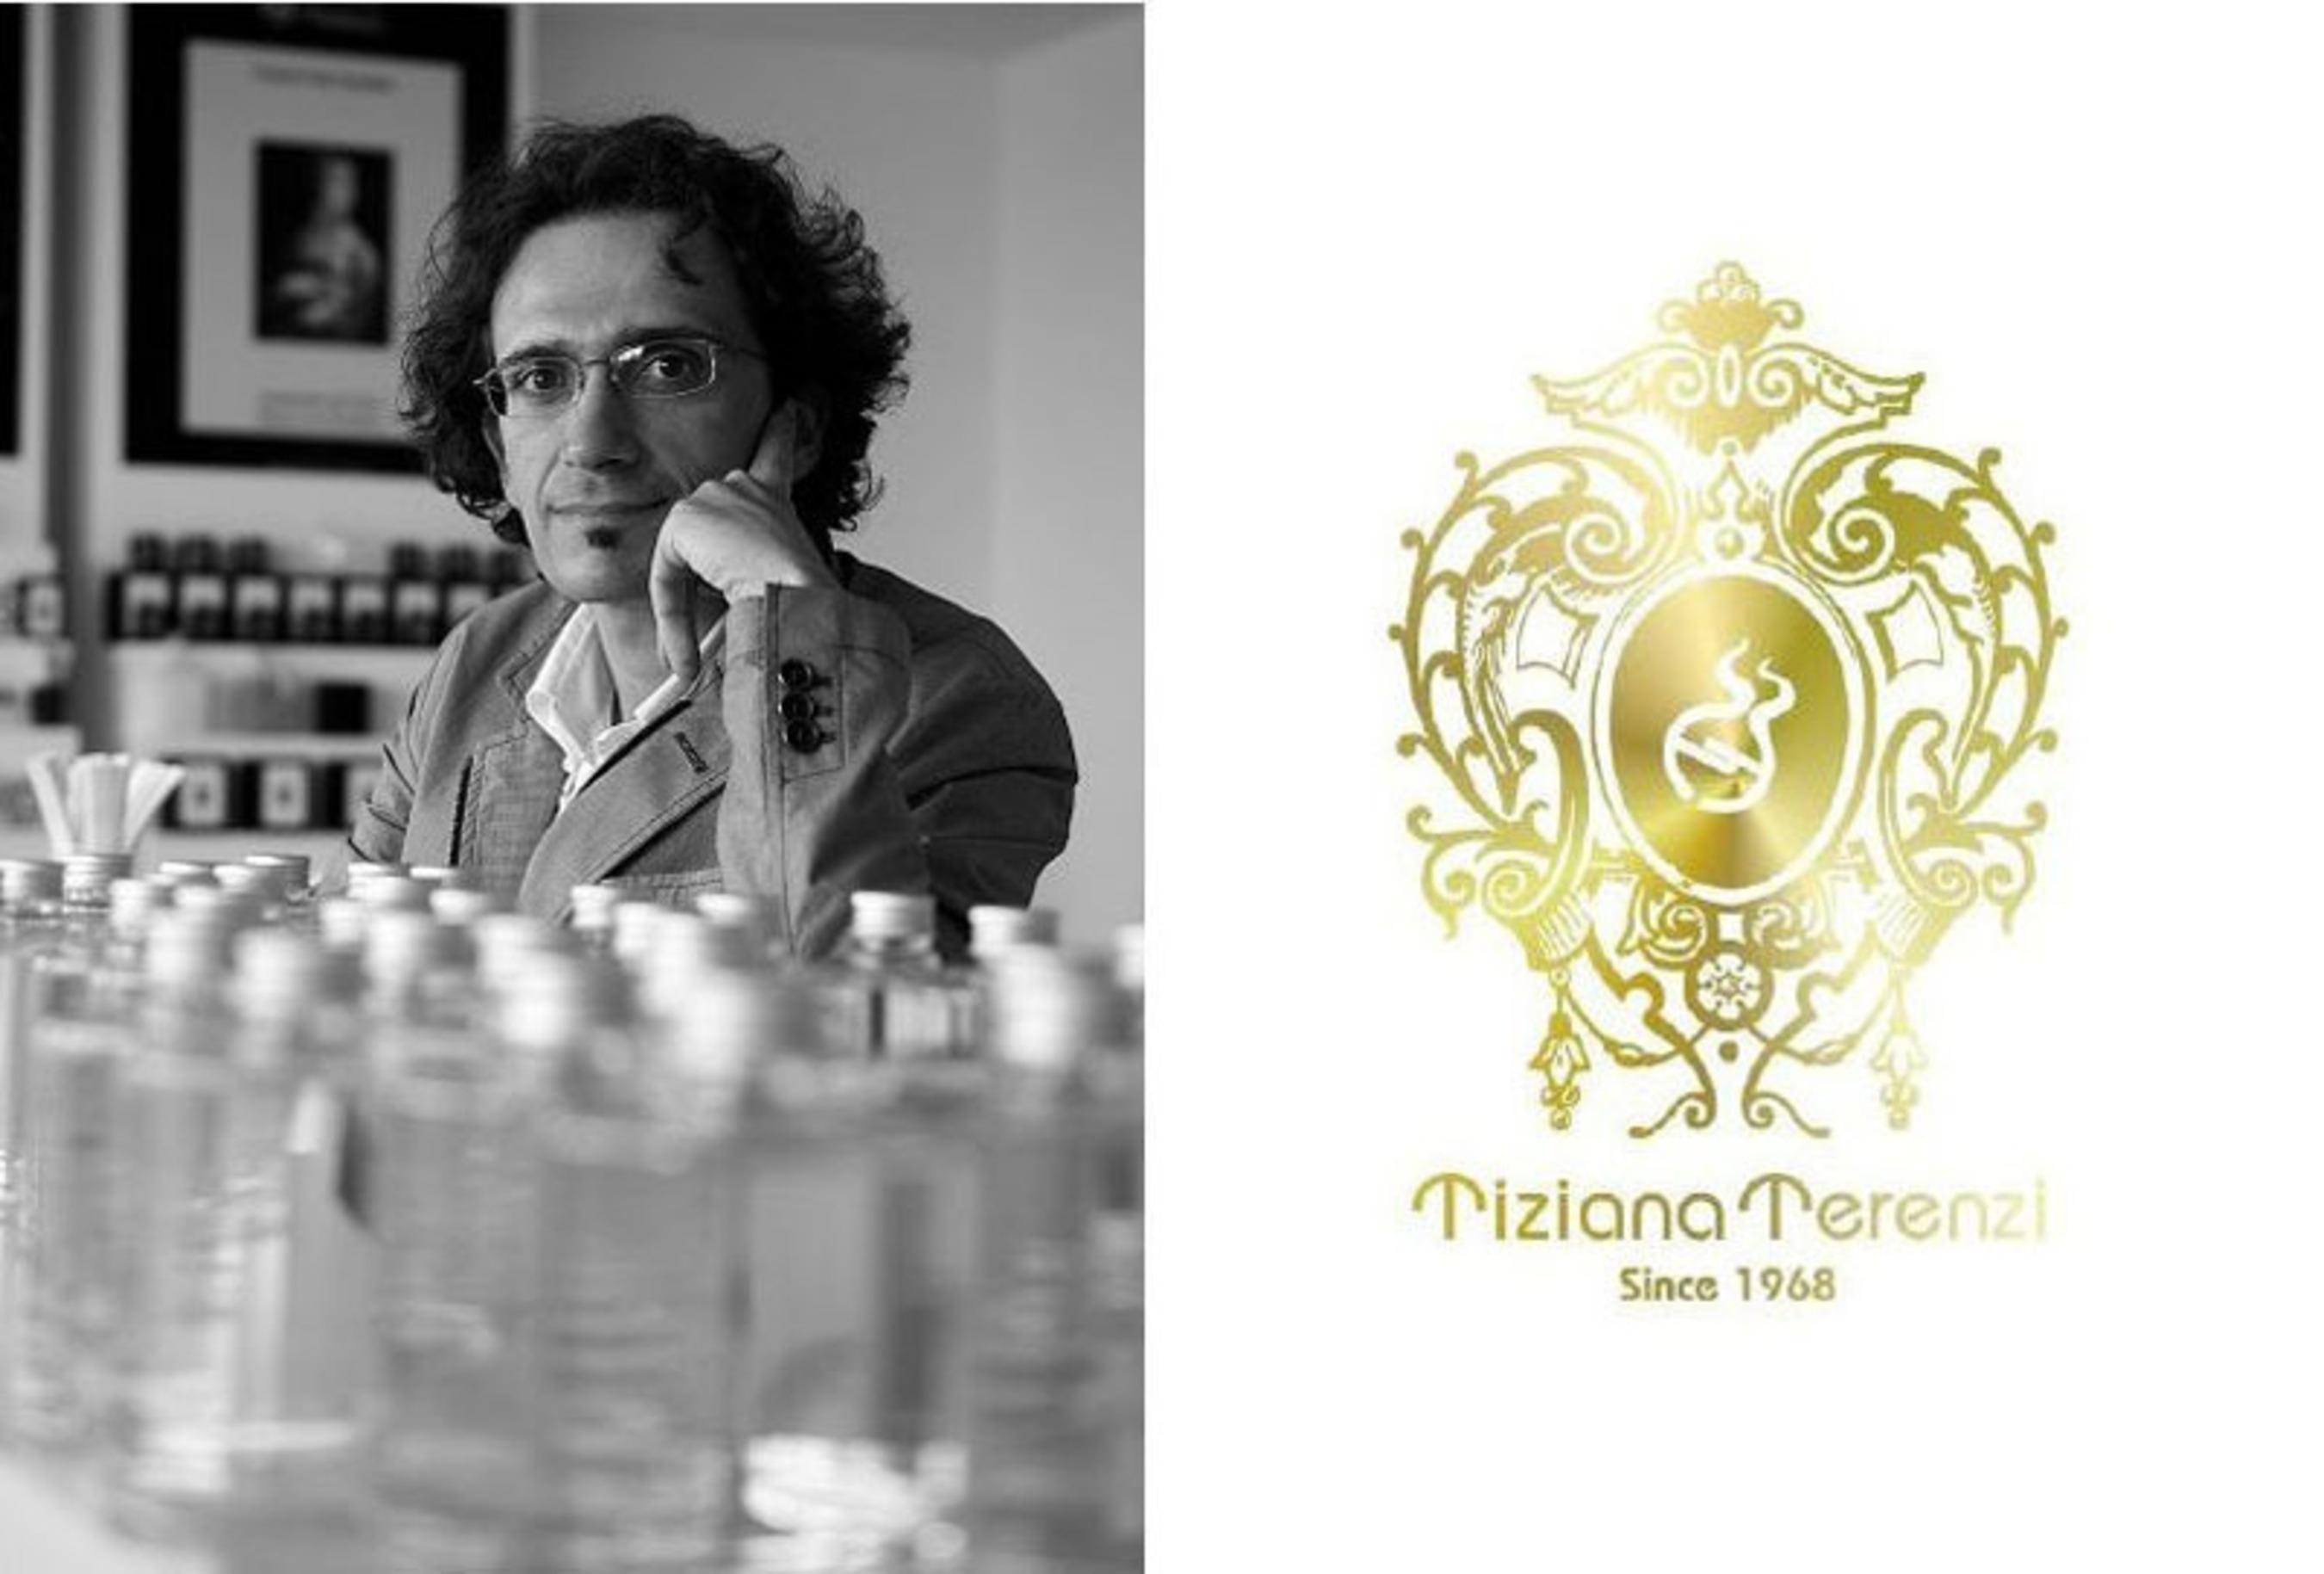 Tiziana Terenzi headshot. (PRNewsFoto/The Fragrance Group)